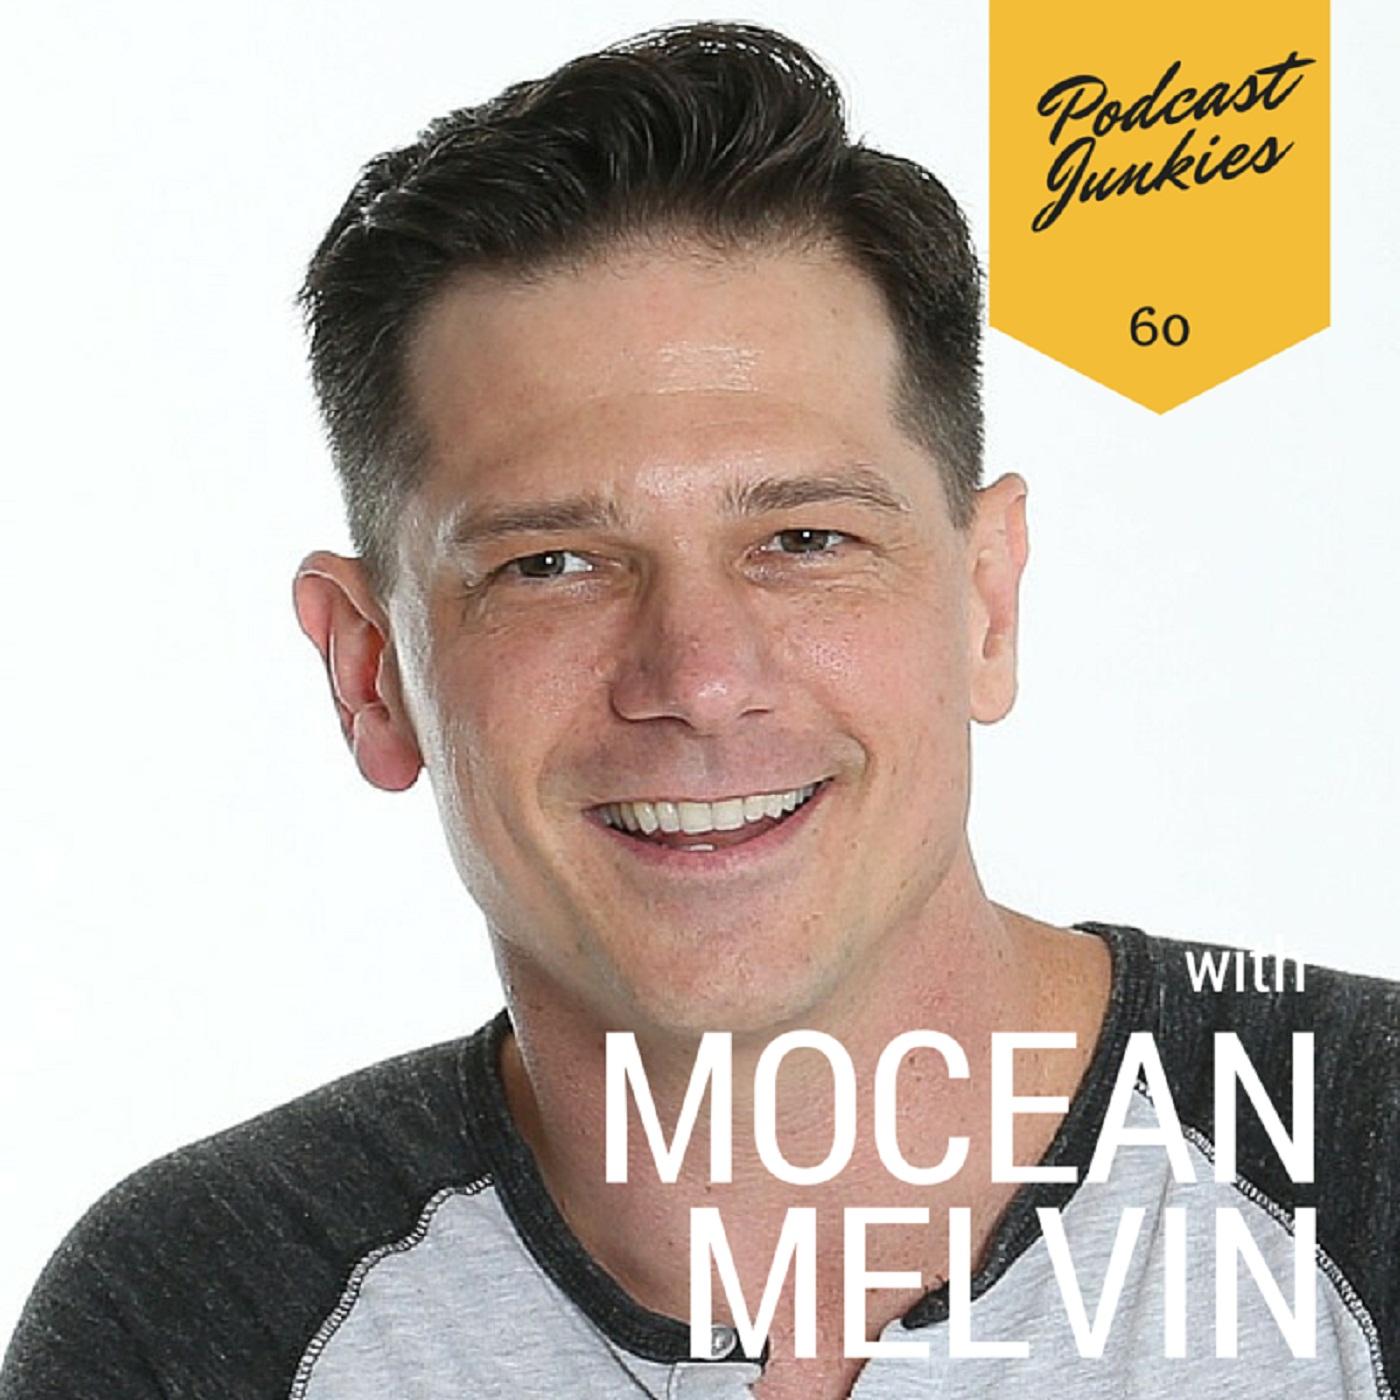 060 Mocean Melvin | It's Not Easy Being So Funny